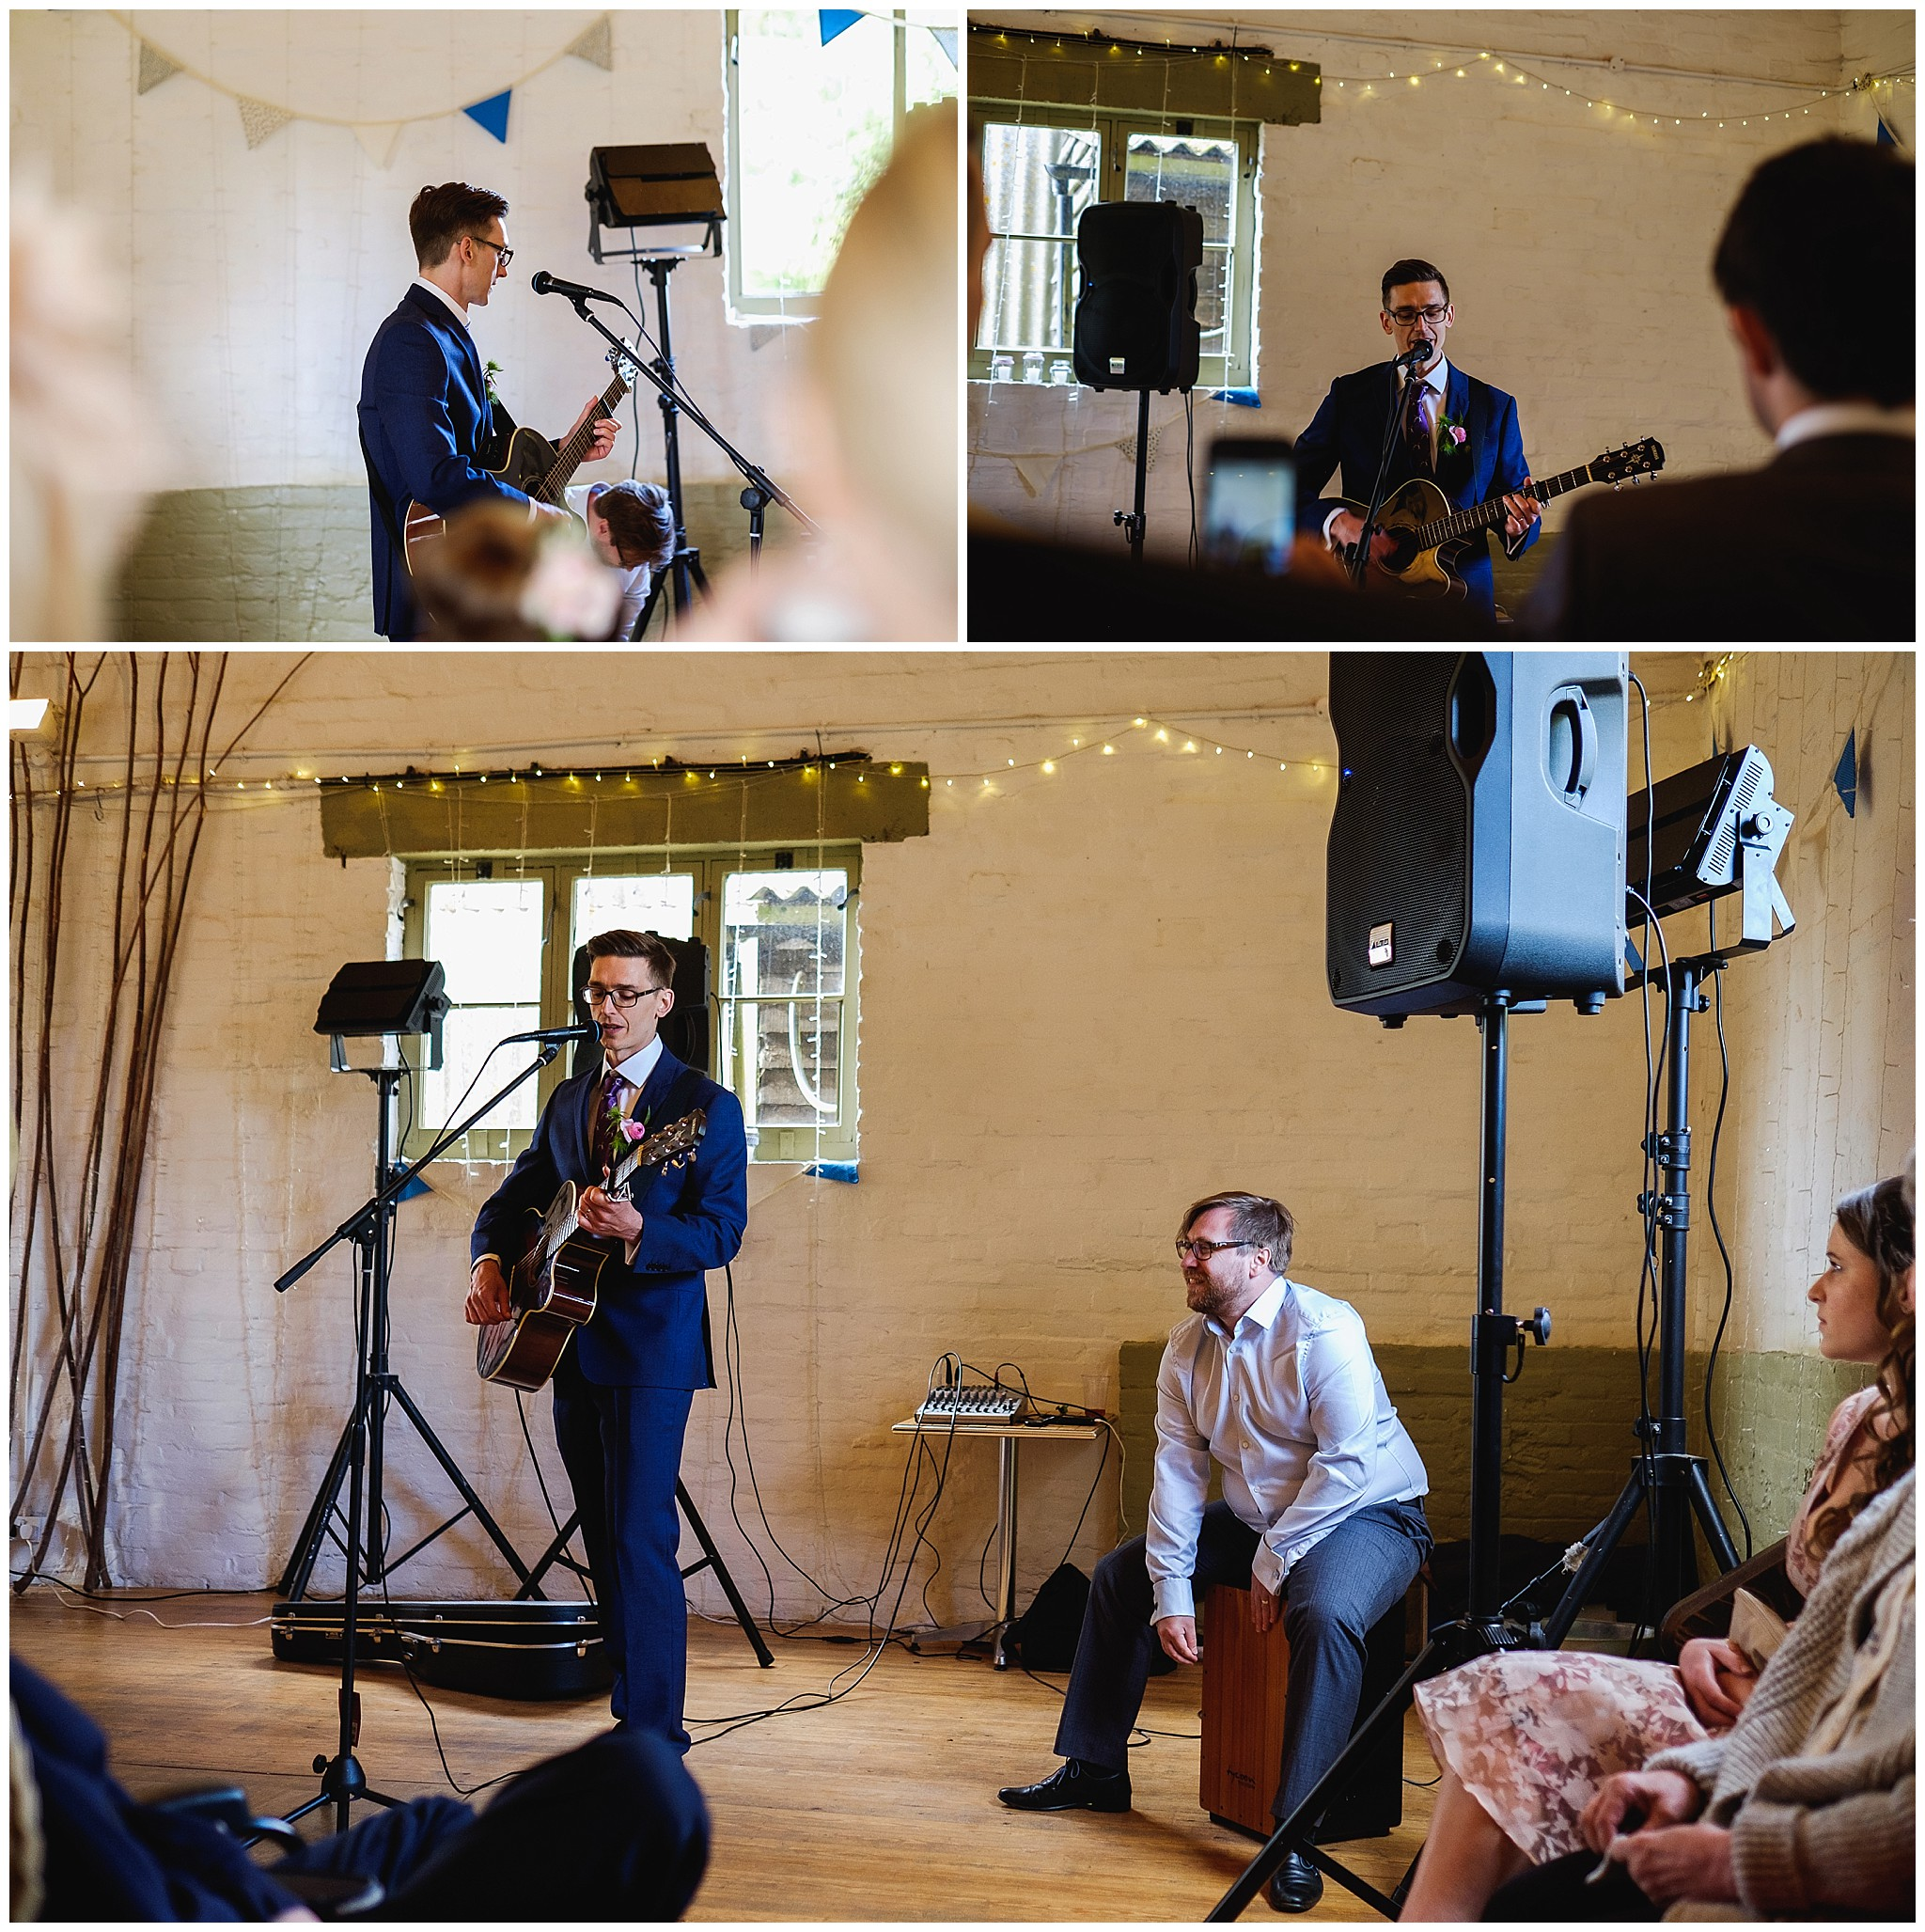 Groom serenade Bride on acoustic guitar